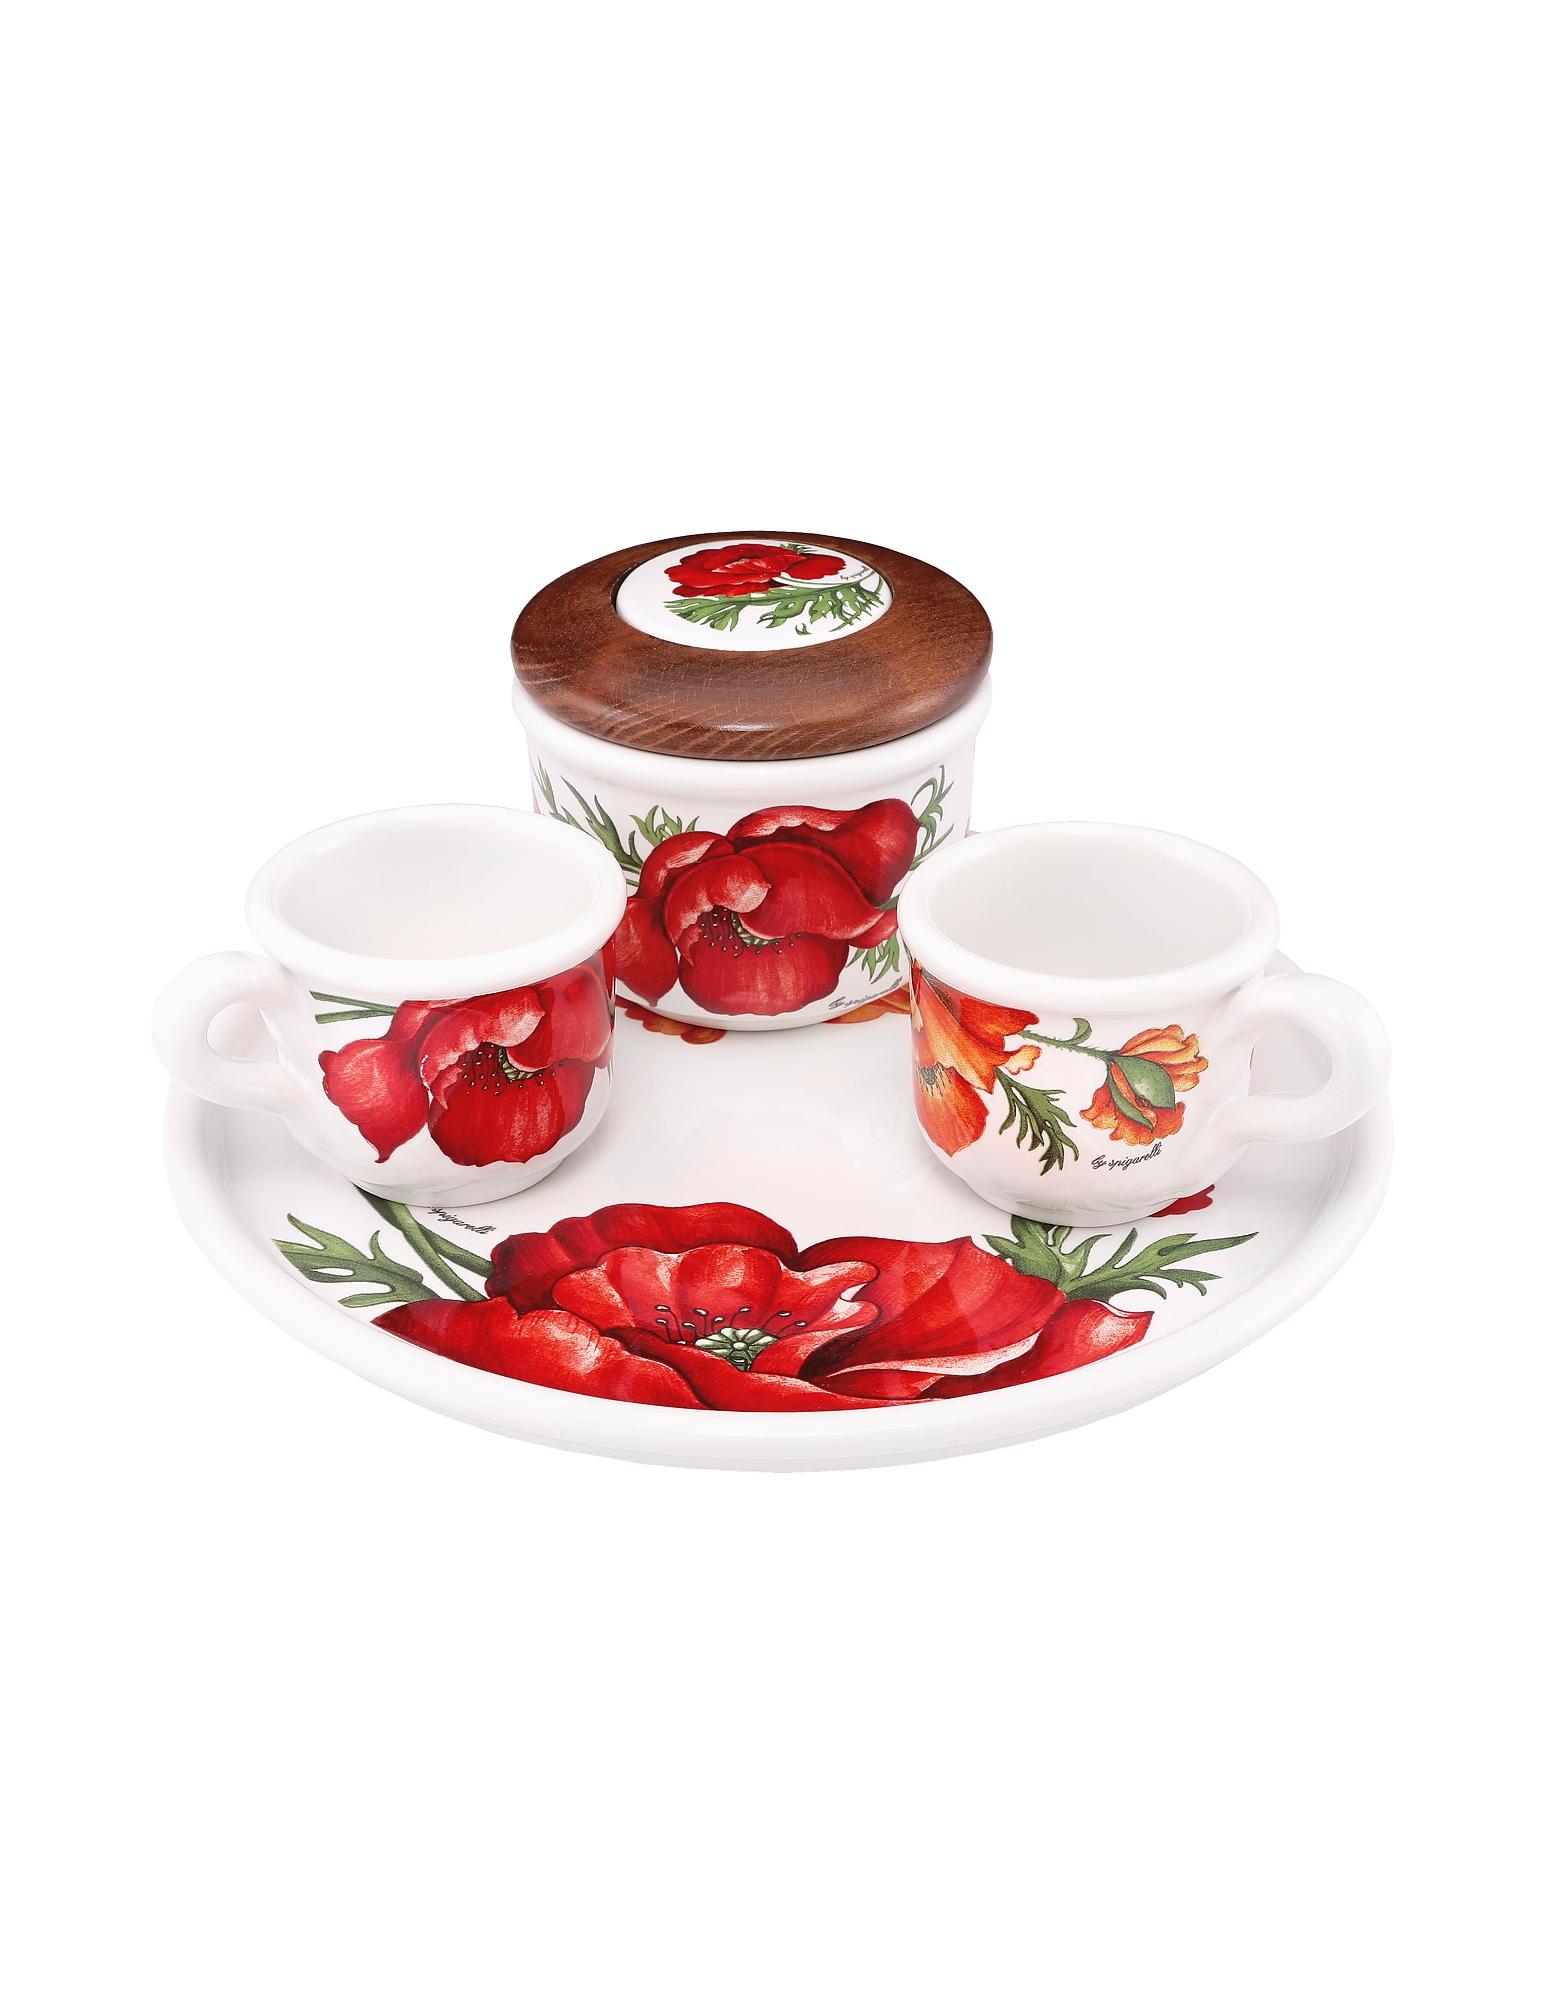 Spigarelli Designer Kitchen & Dining, Sugar and Mocha Cups Poppy Ceramic Set w/Tray